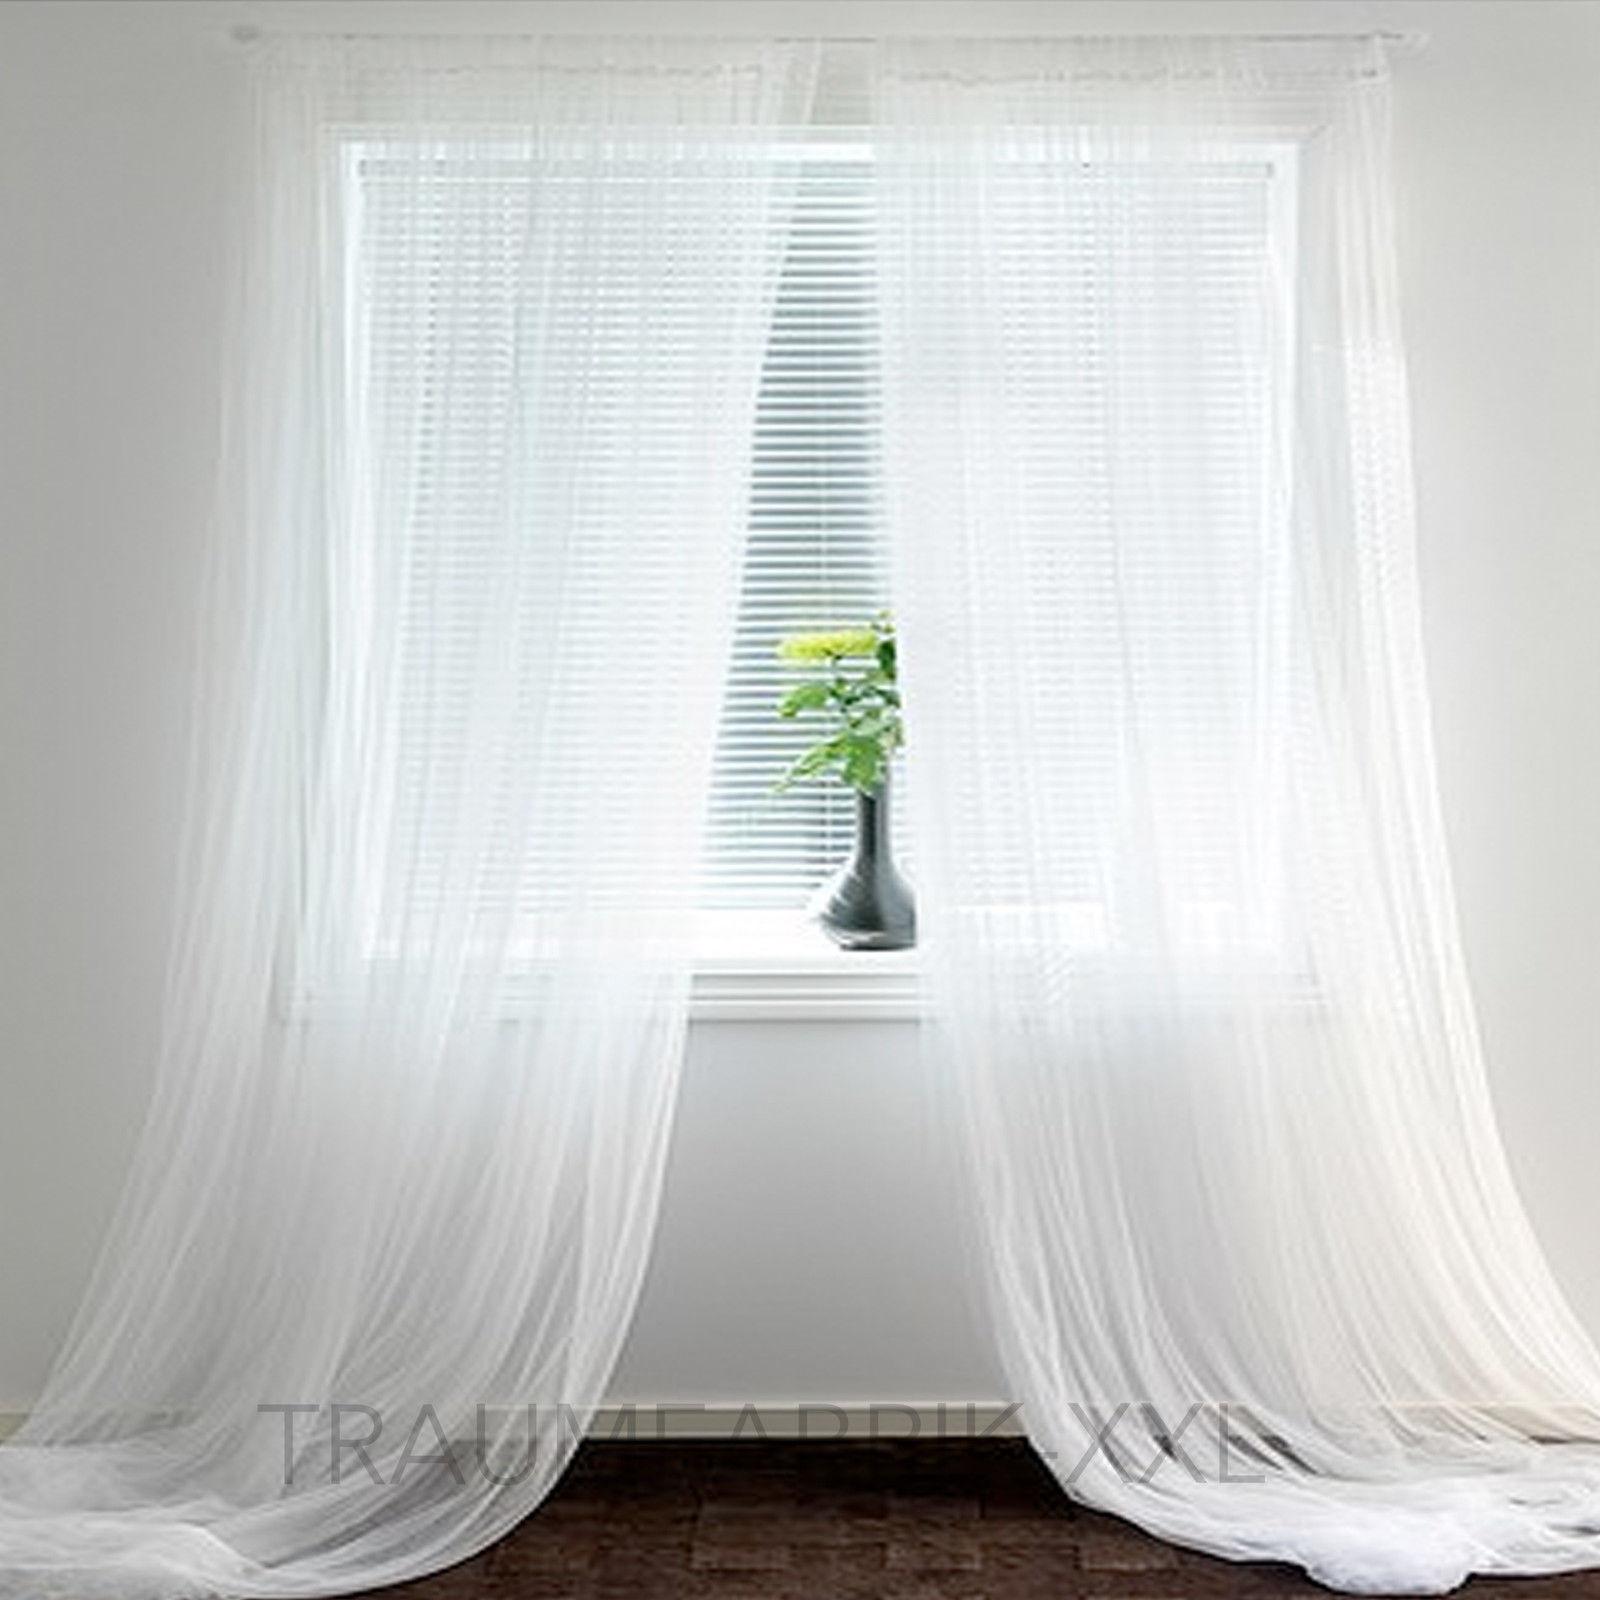 Ikea Vorhang ikea 2 gardinenschals gardinenschal vorhang schlaufenschal gardine